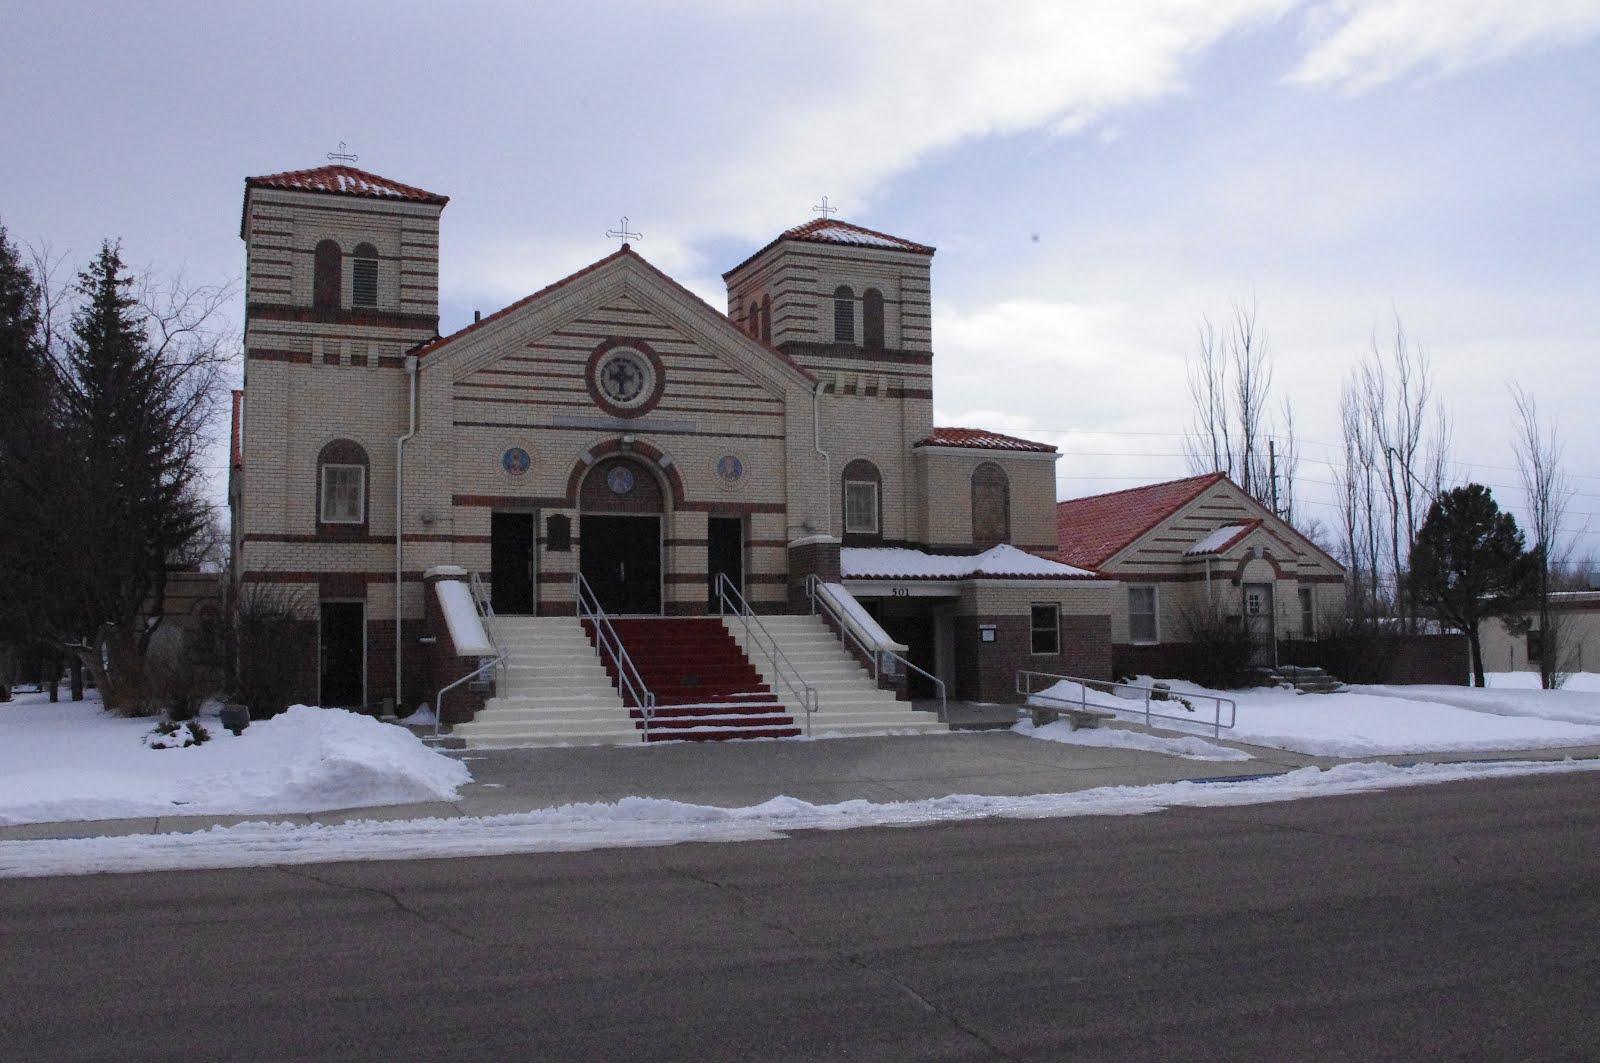 Cheyenne, Wyoming - Capitol Avenue | Main Street Blog